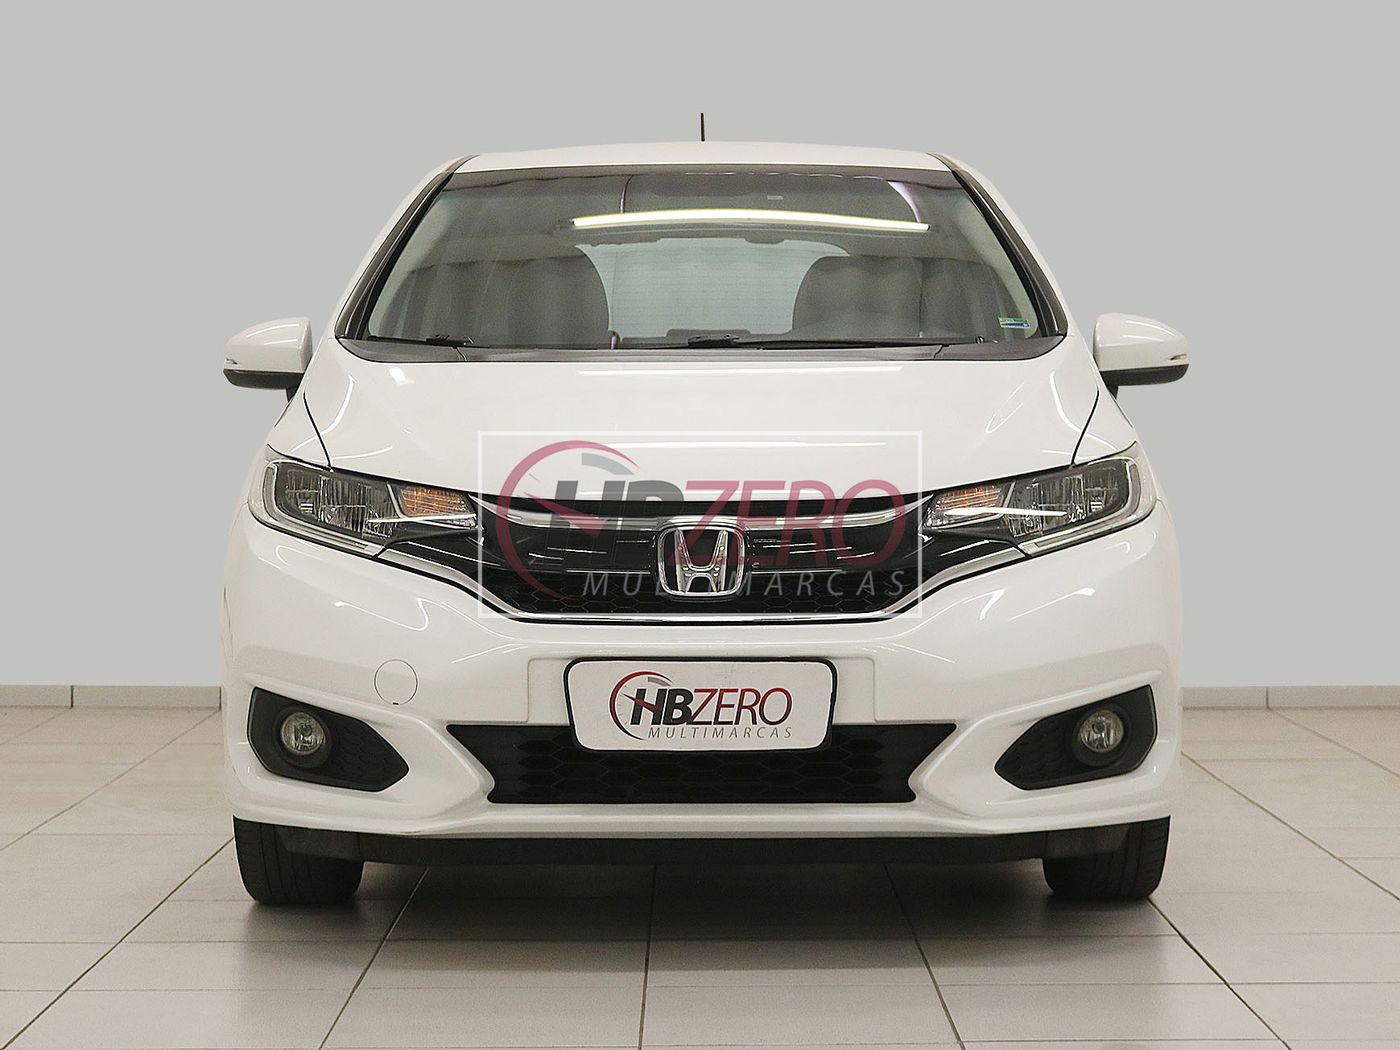 Honda Fit EXL 1.5 Flex/Flexone 16V 5p Aut